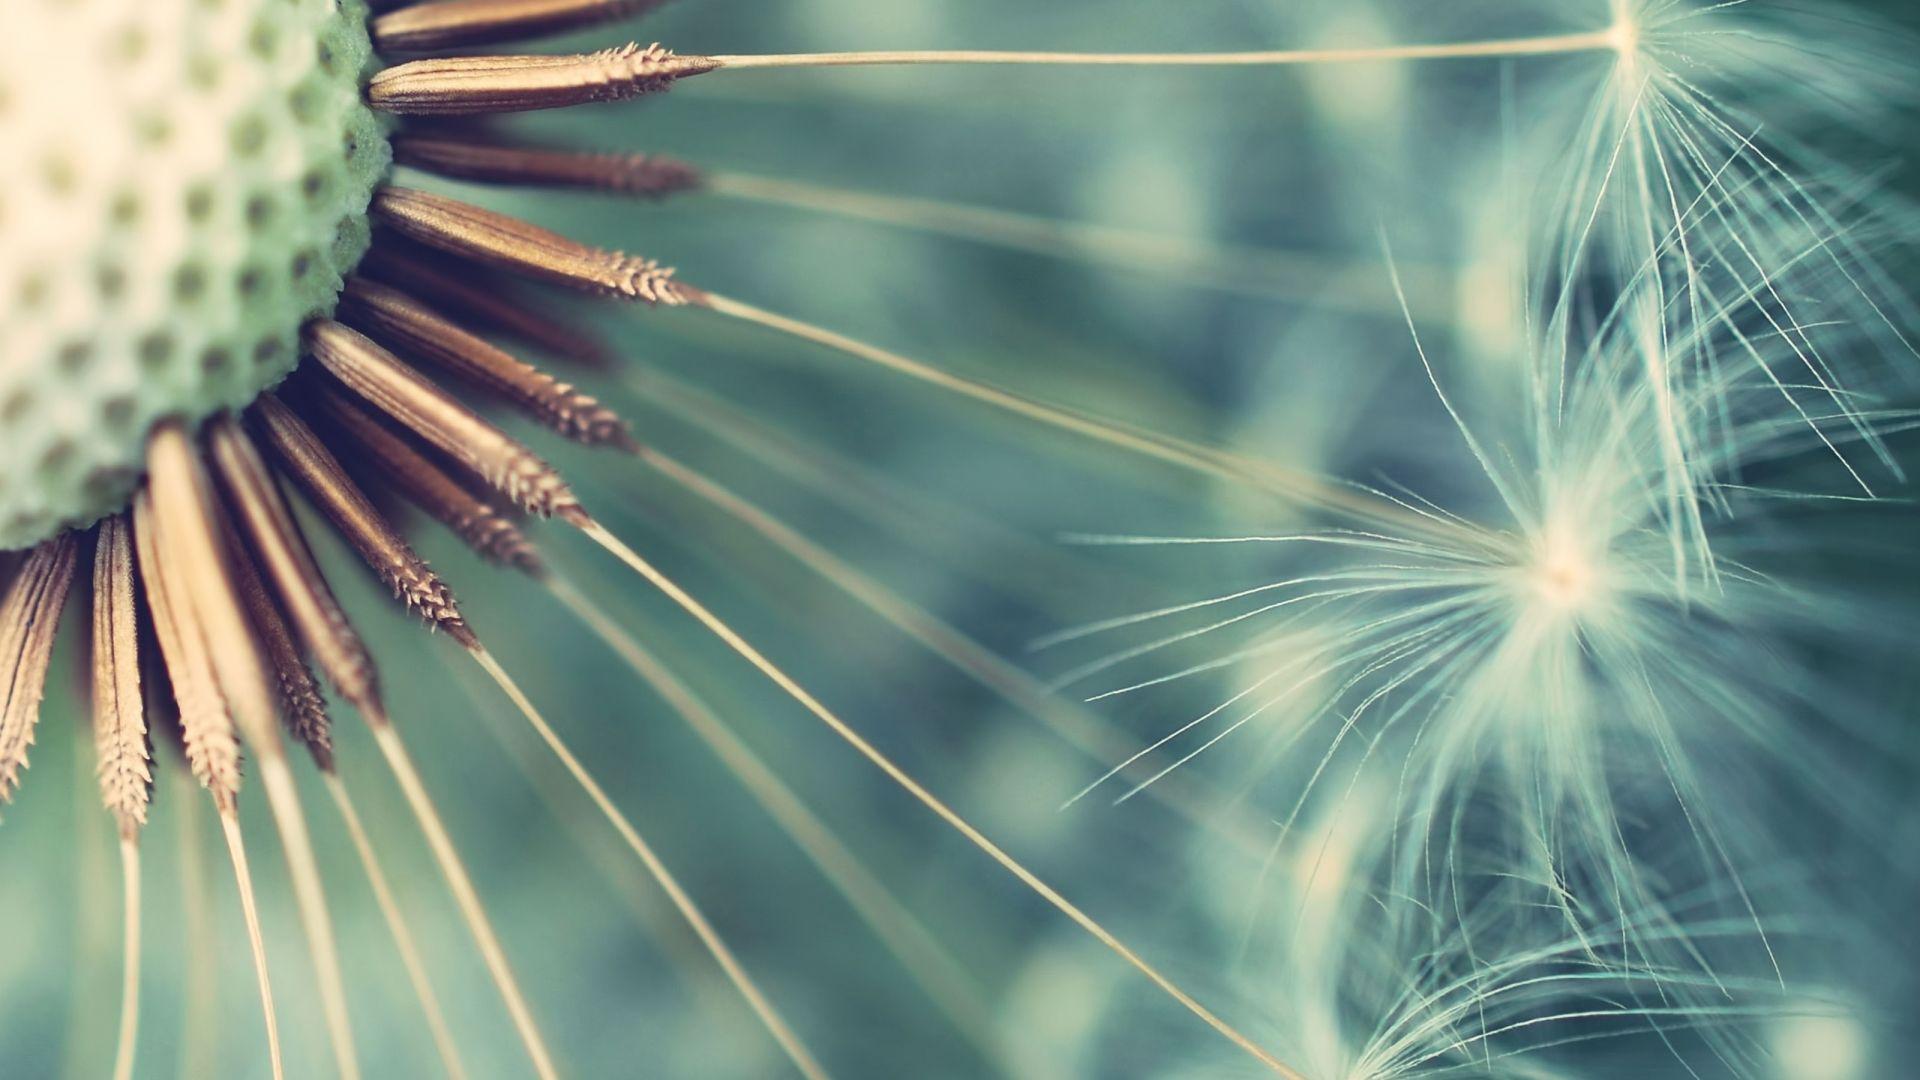 Dandelion hd wallpaper 1080p for pc